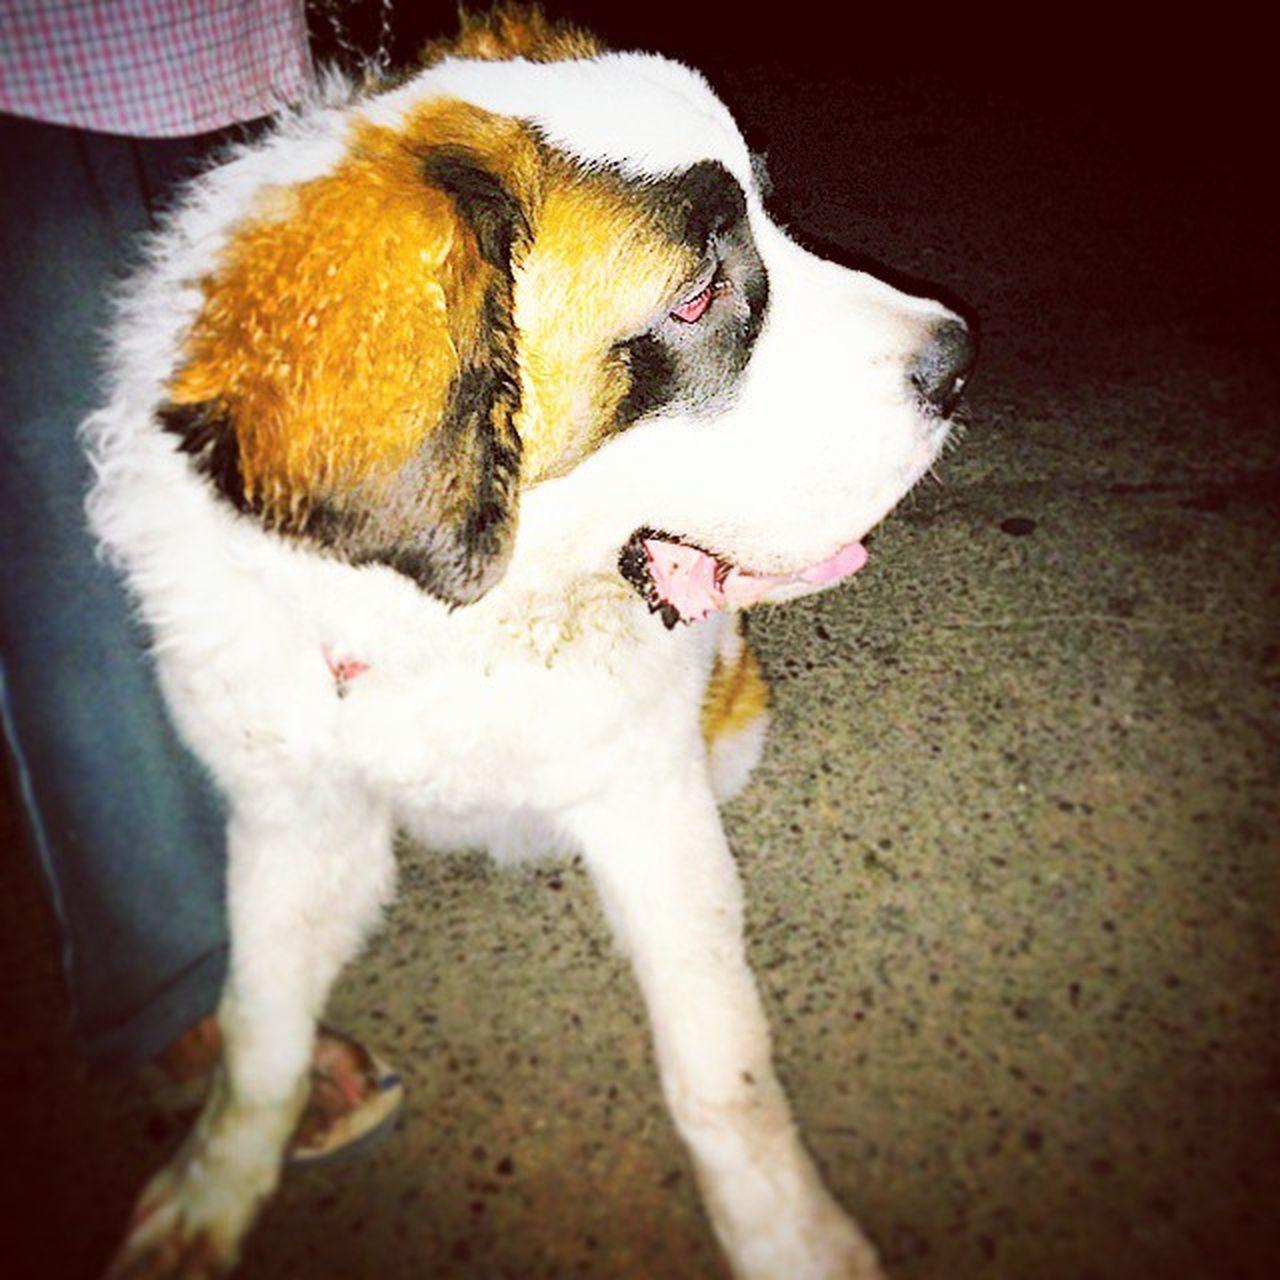 Baadal Stbernard DogPerson Doglover Nexus5photography